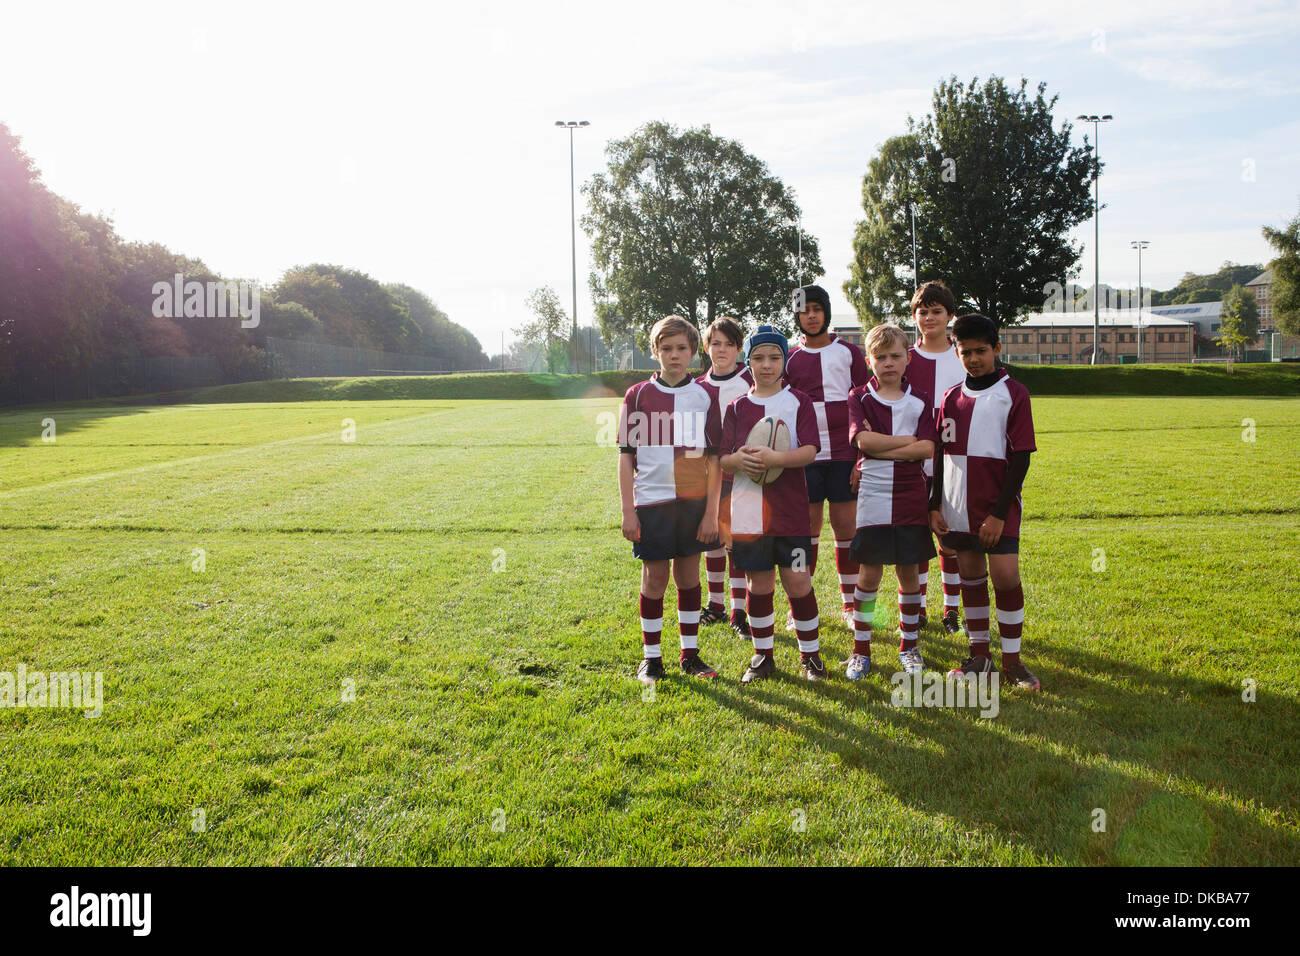 Group portrait of teenage schoolboy rugby team - Stock Image